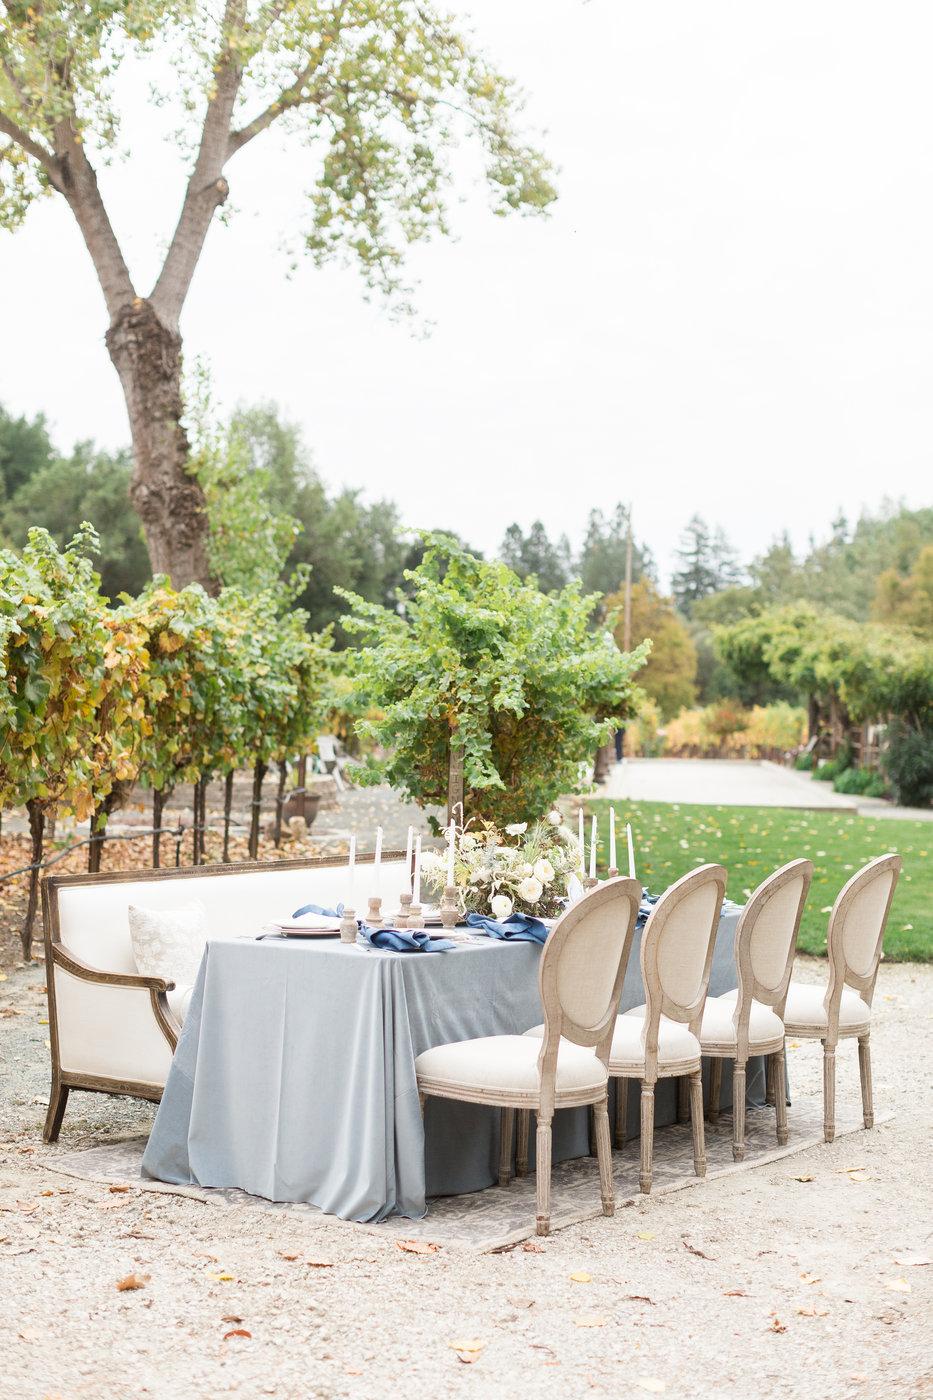 Monte-verda-inn-forest-hill-california-wedding-photographerpg